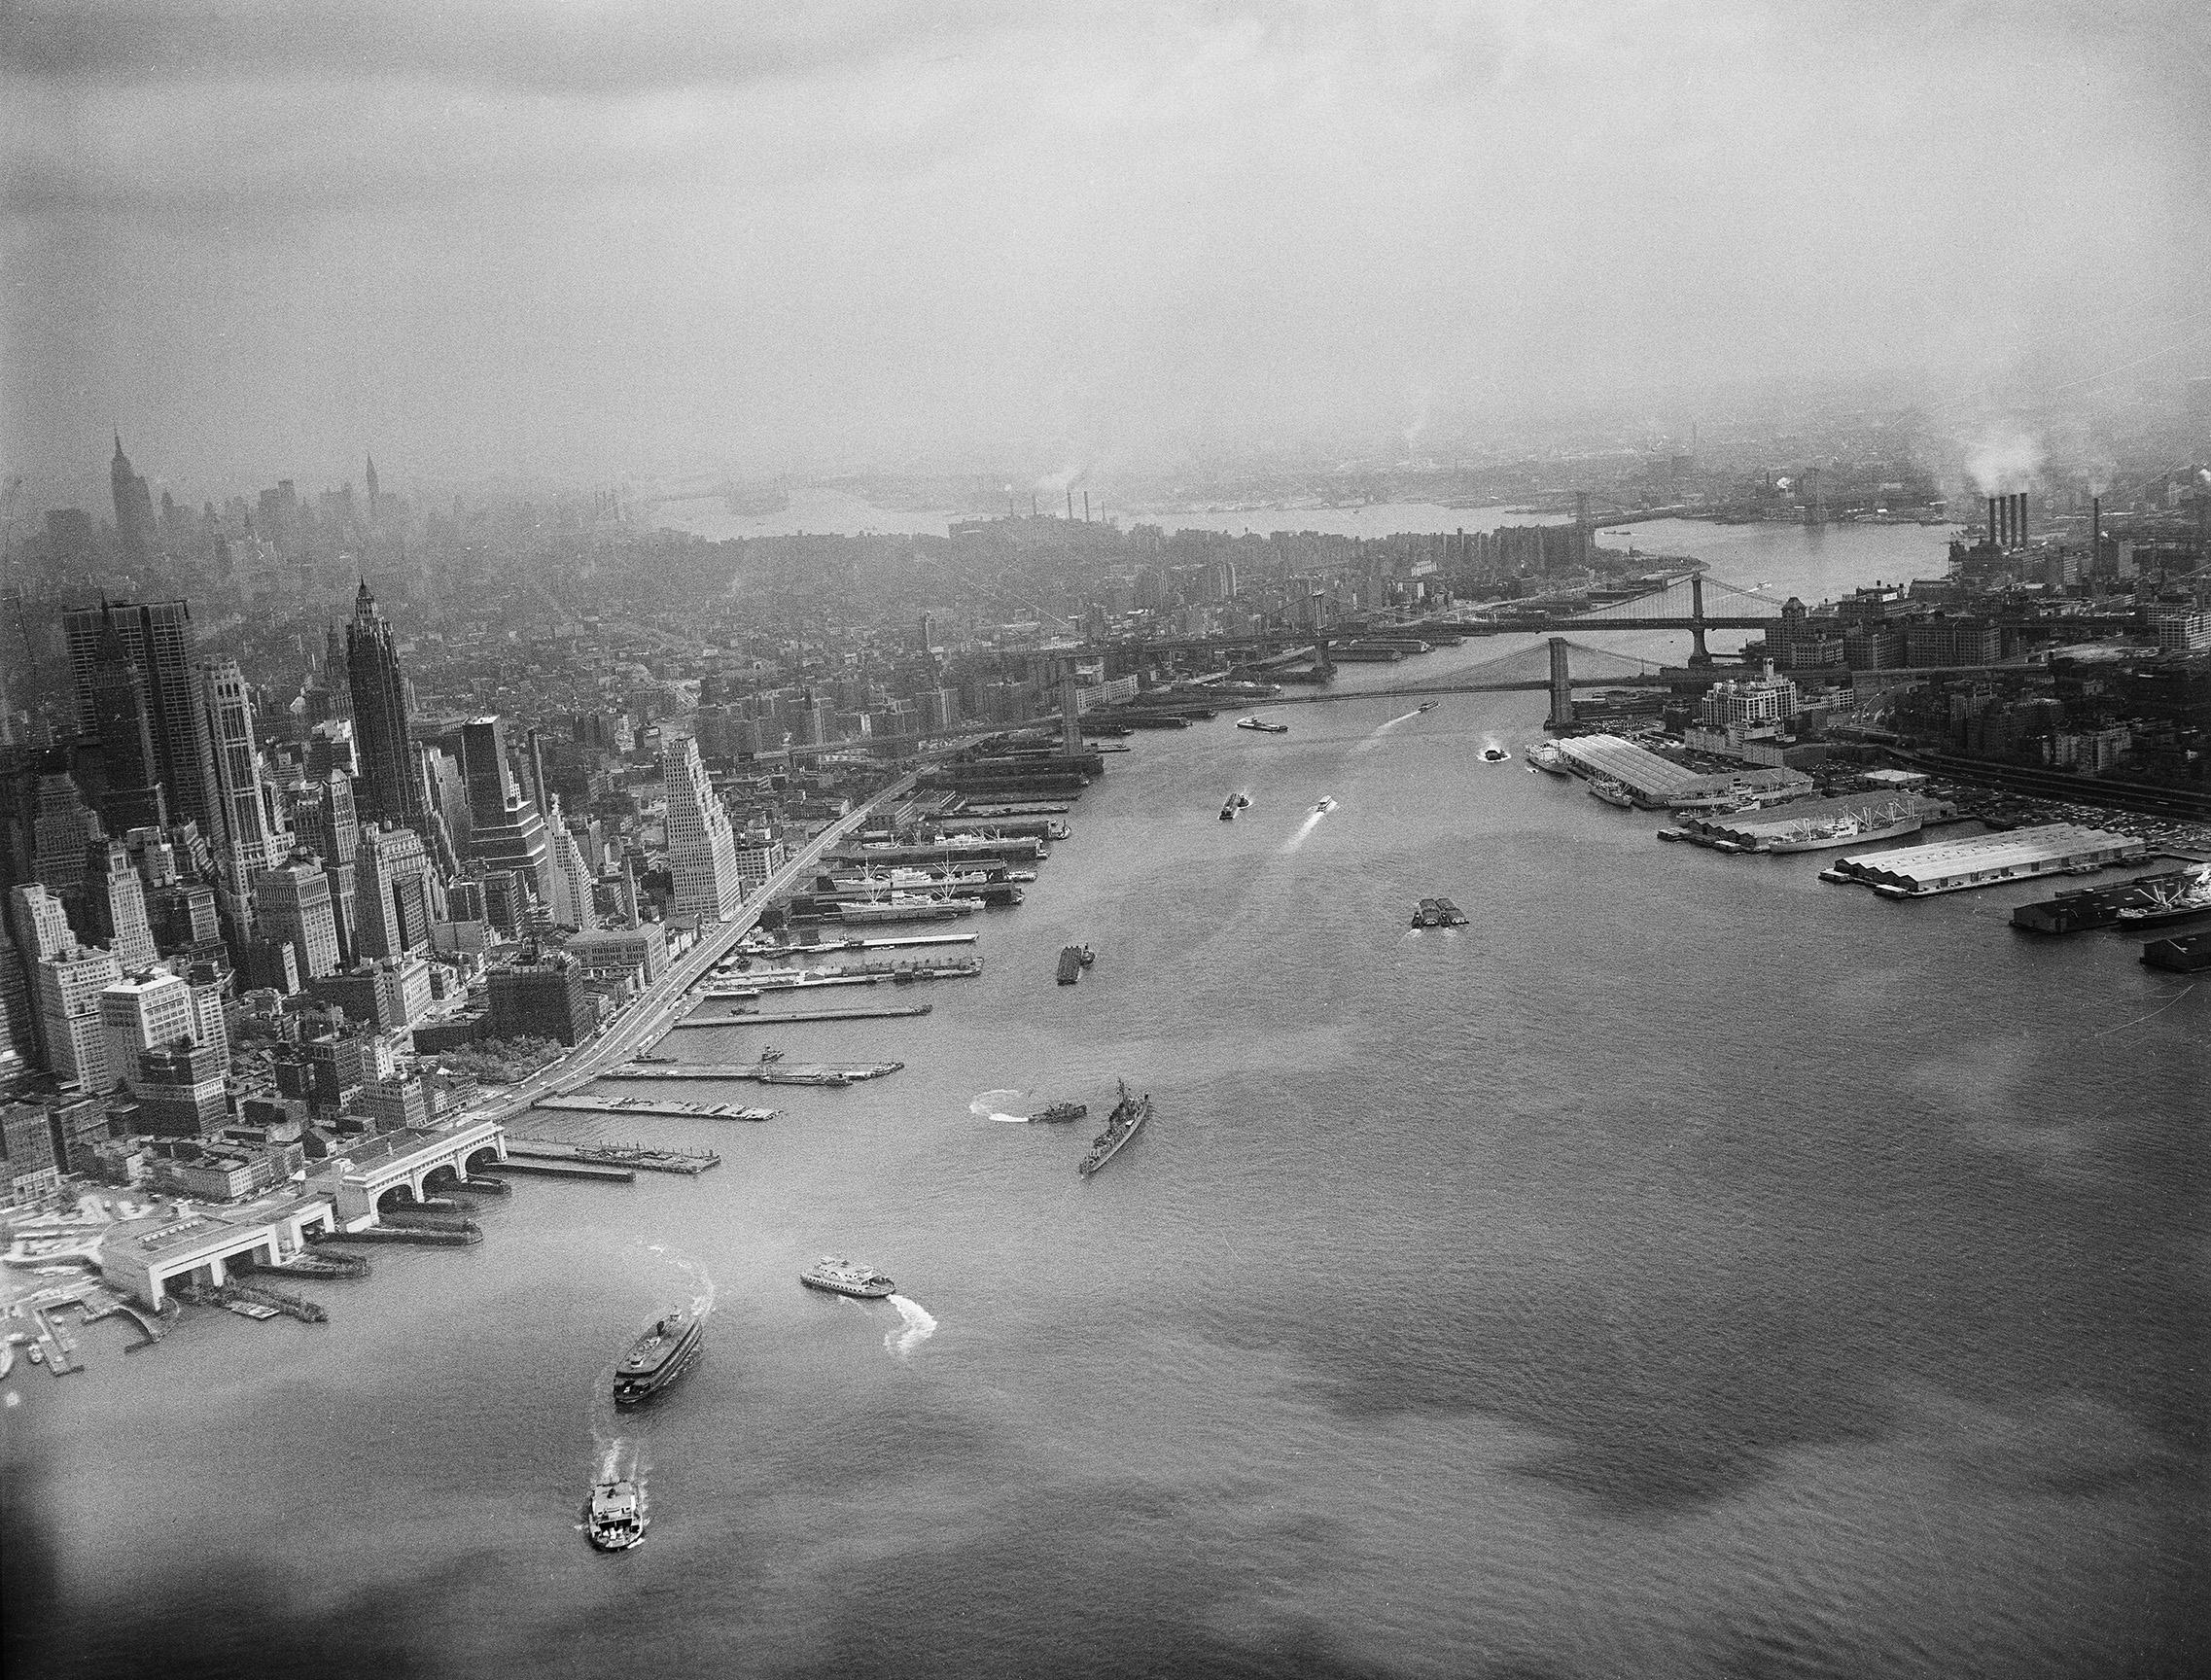 New York Harbor, May 27, 1960